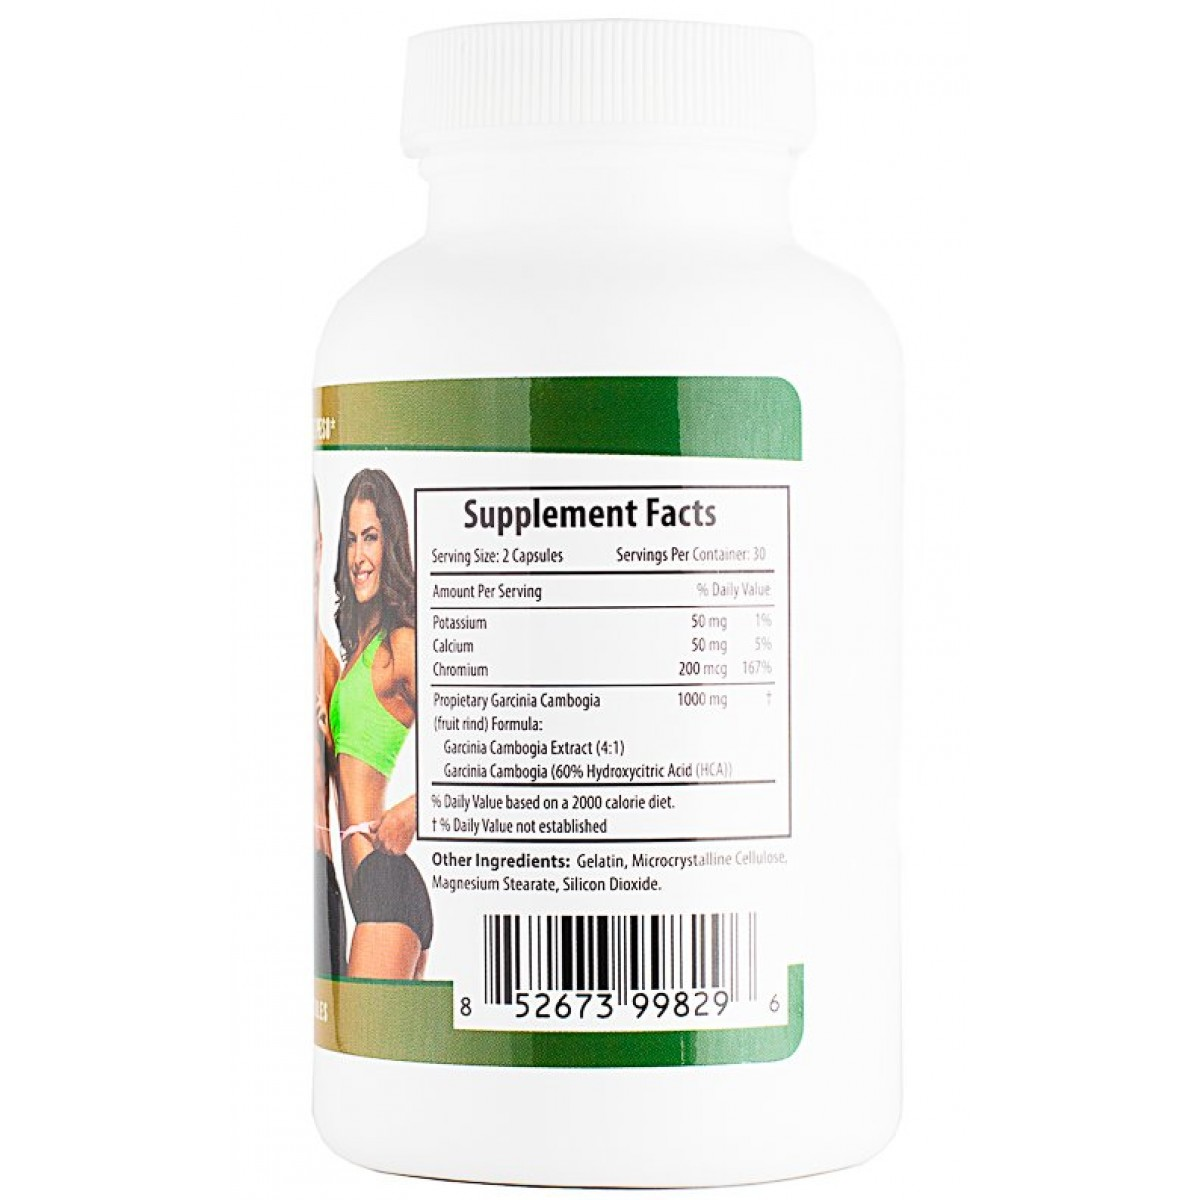 Weight Loss Sglt2 Inhibitors